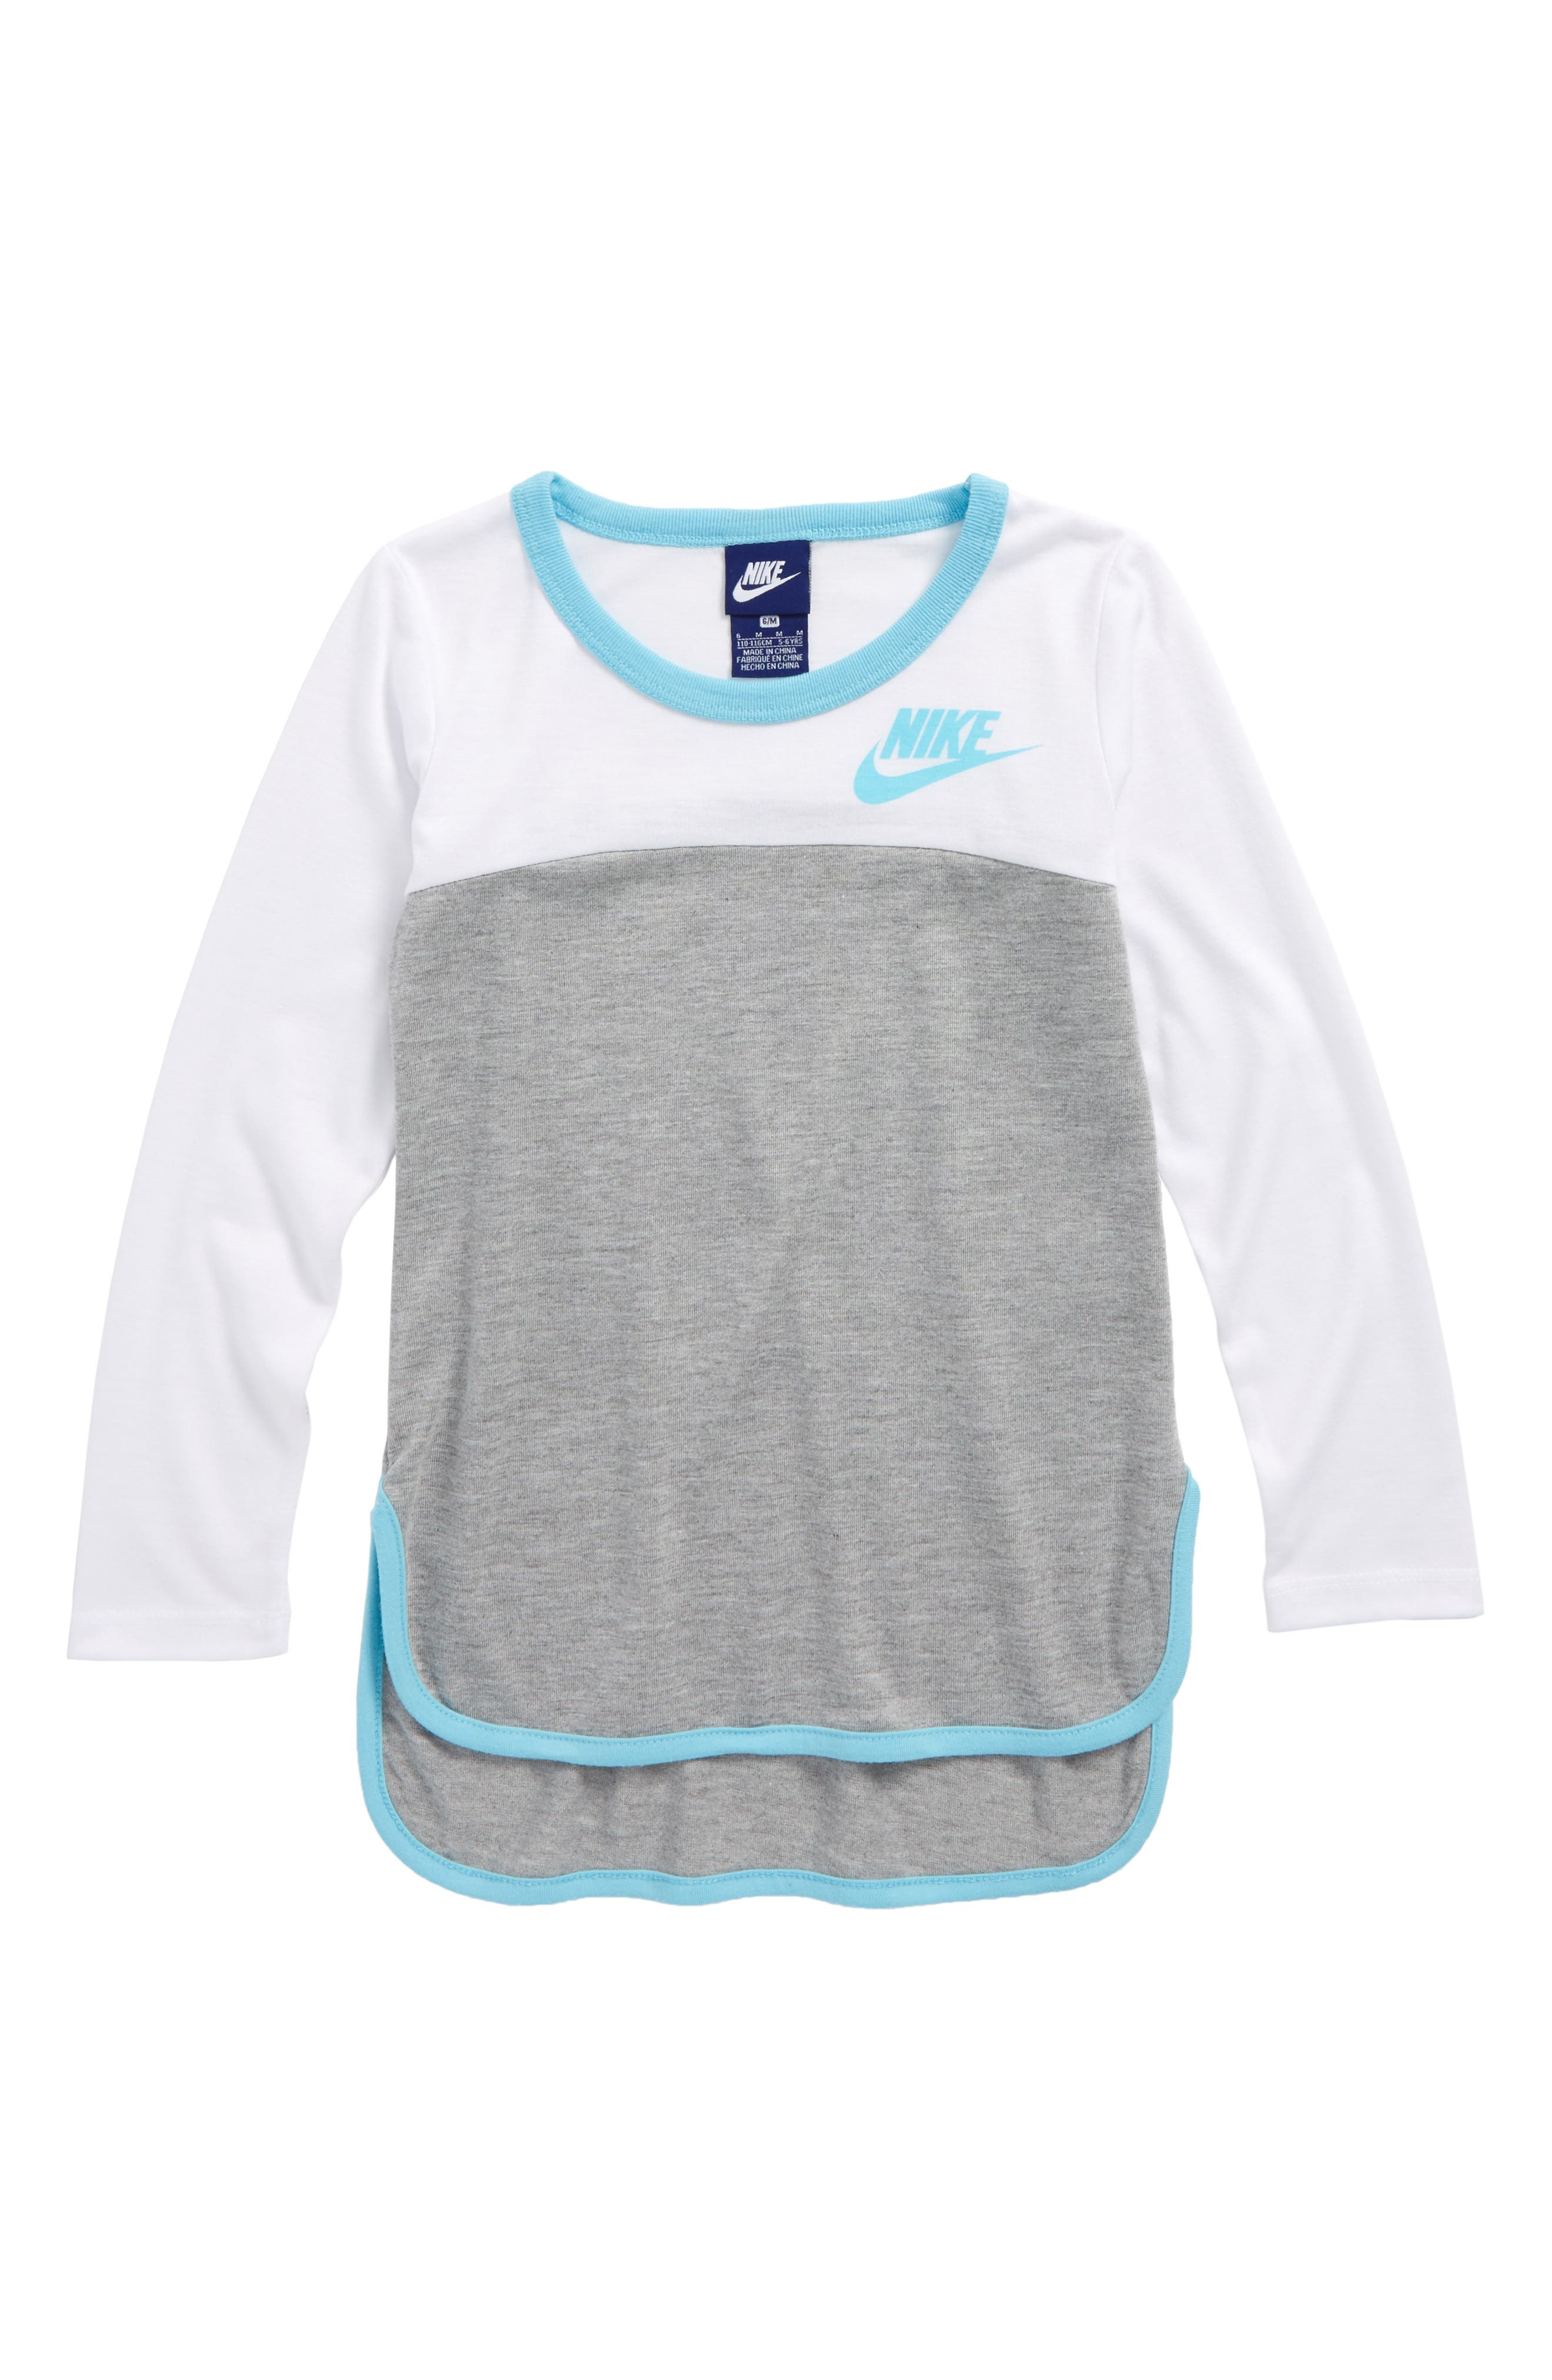 Alternate Image 1 Selected - Nike Color Block Long Sleeve Tee (Toddler Girls & Little Girls)